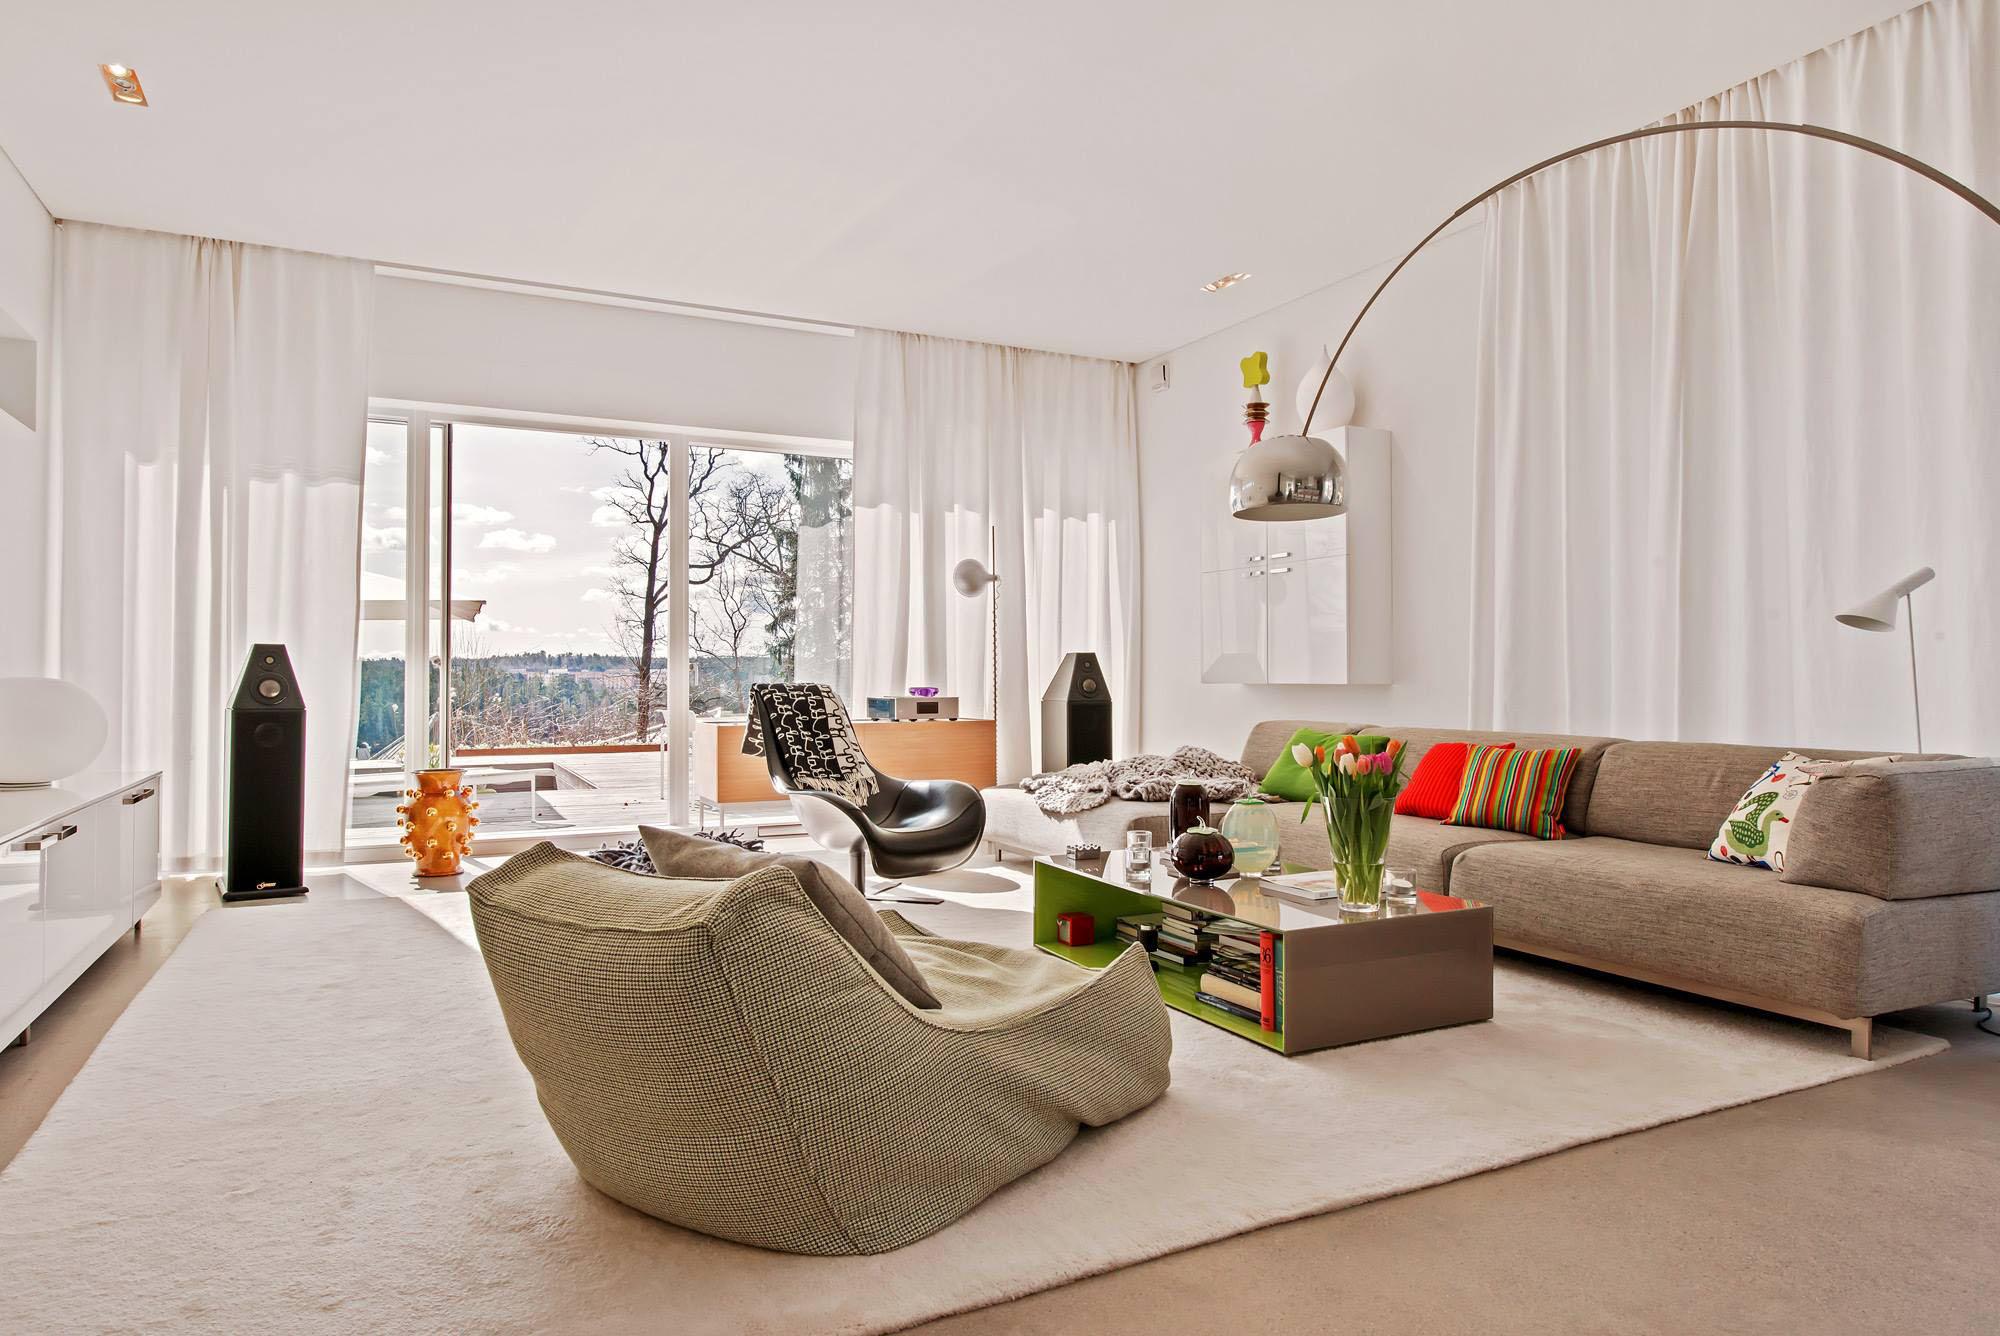 Incredible Modern Villa Design The Villa In Stockholm